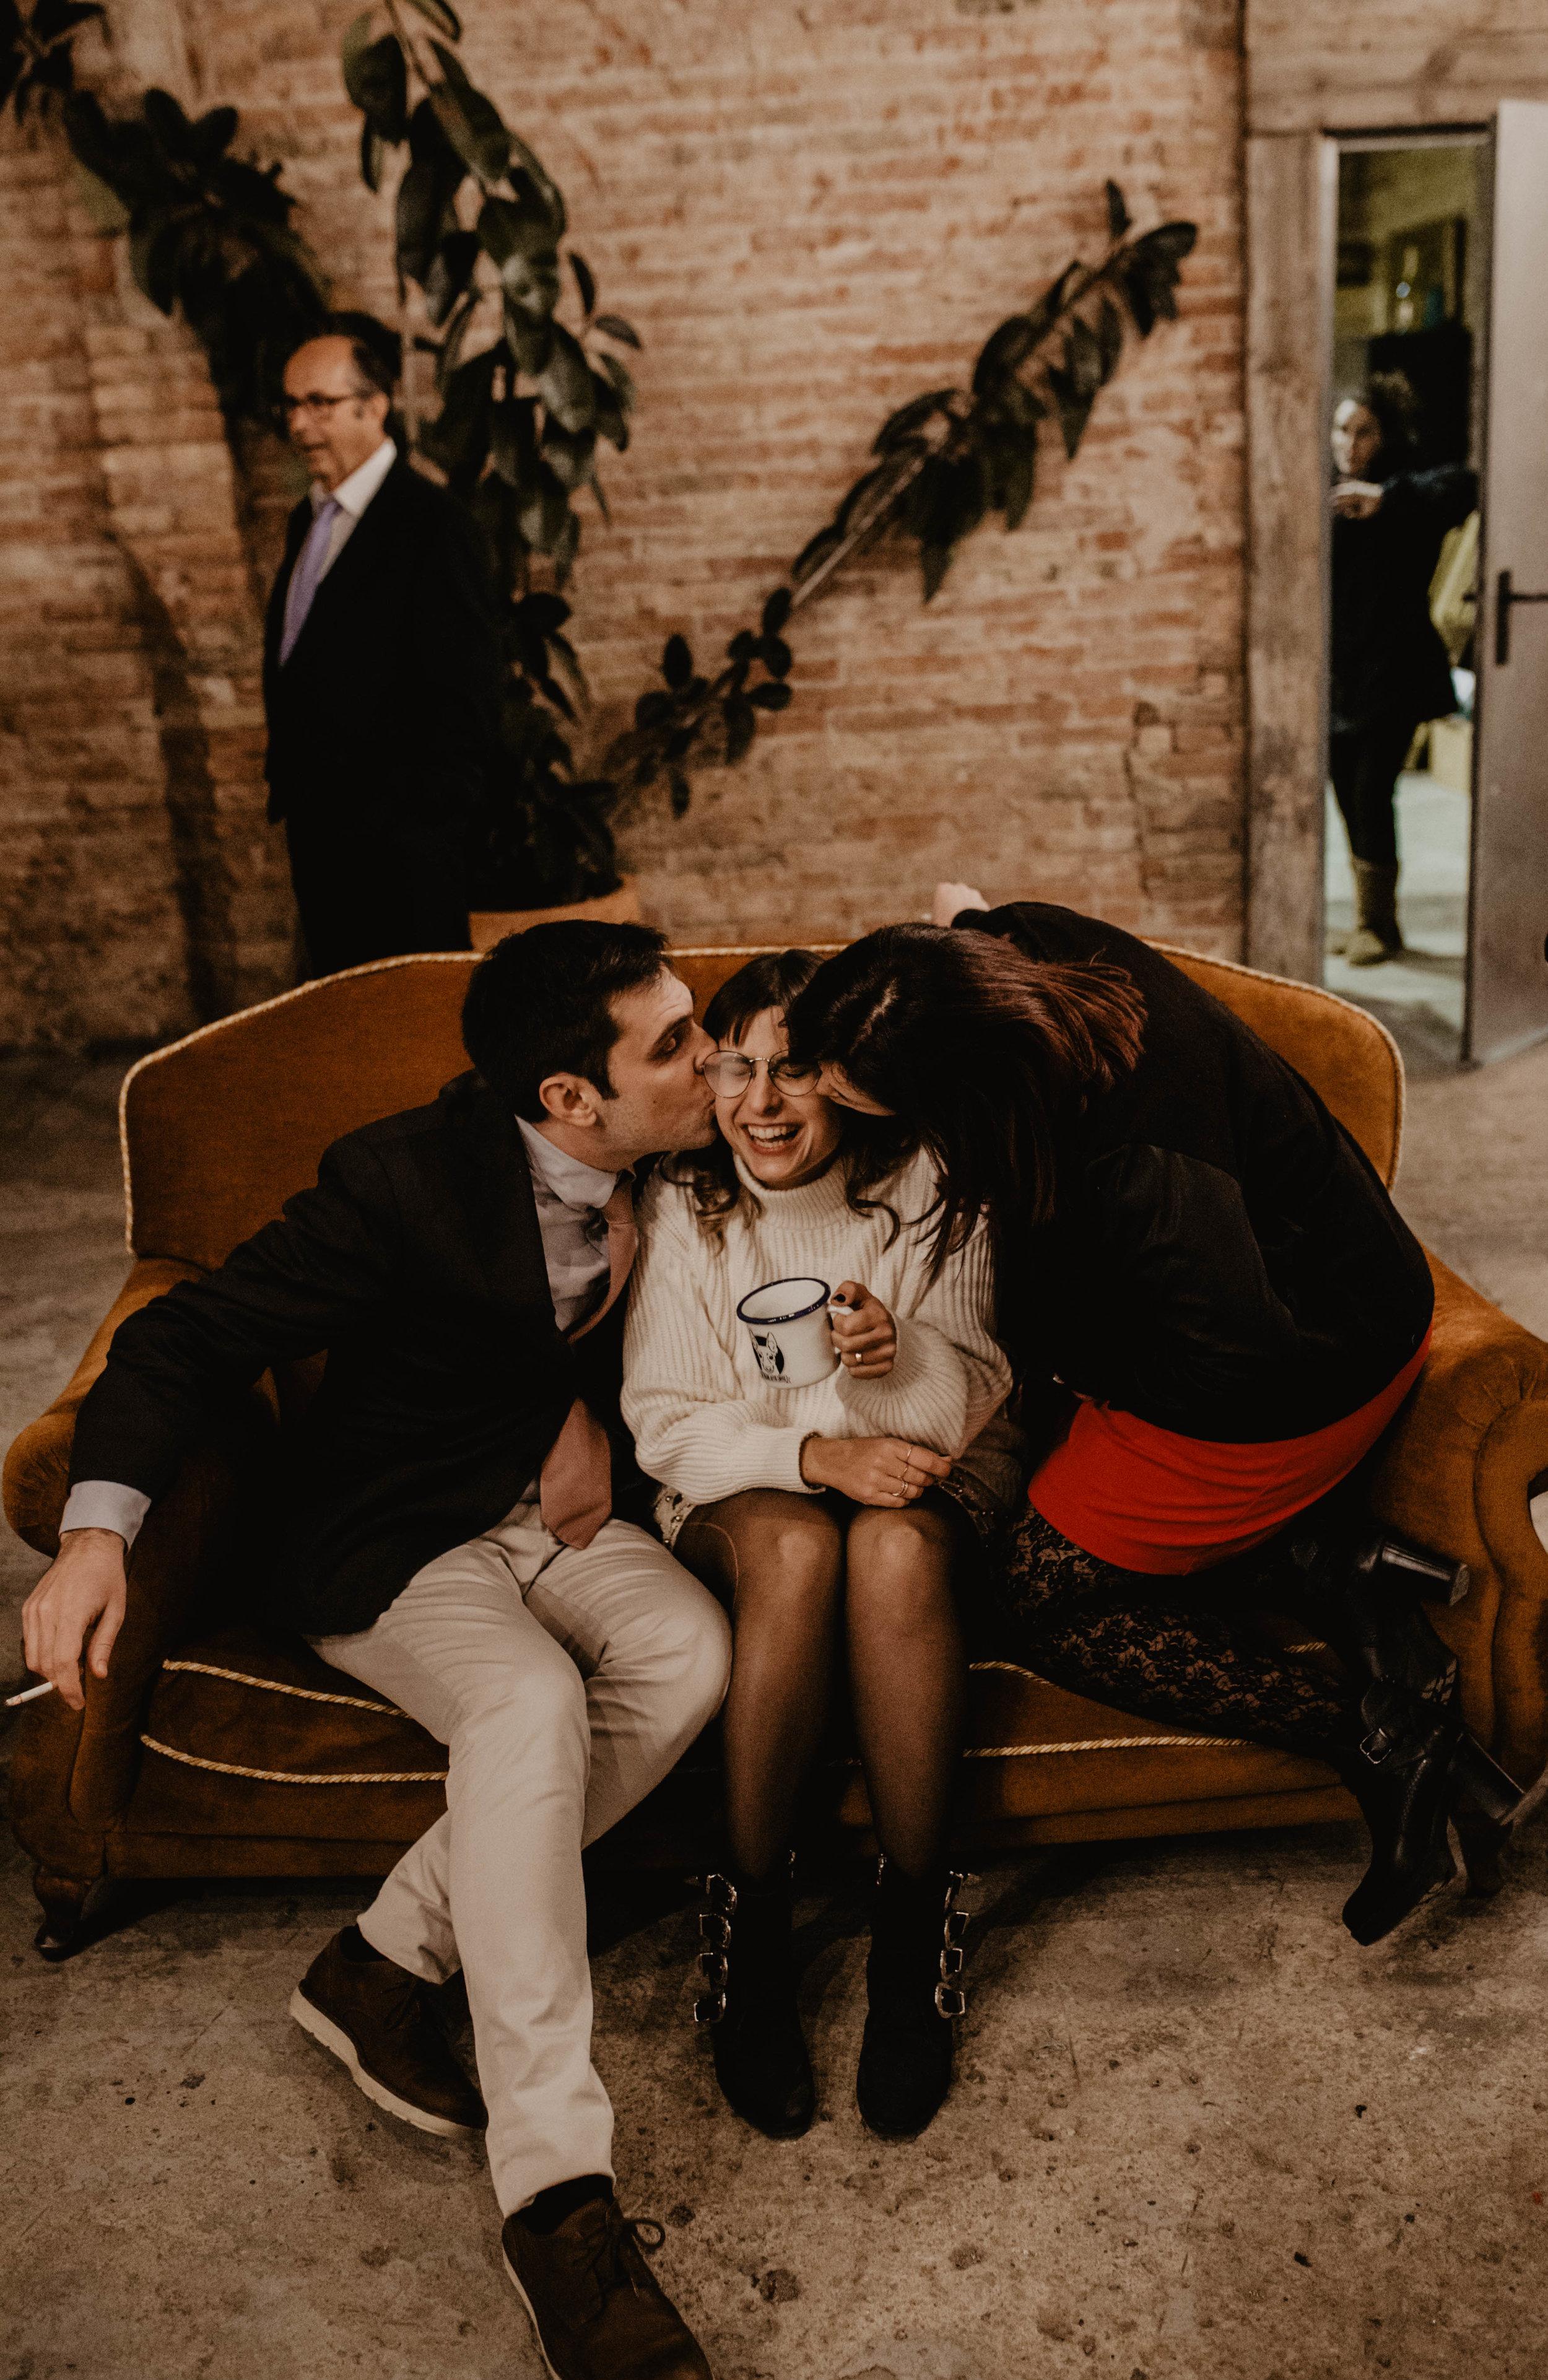 thenortherngirlphotography-photography-weddingphotography-couple-bodasconestilo-bodasenbarcelona-martadavid-1480.jpg